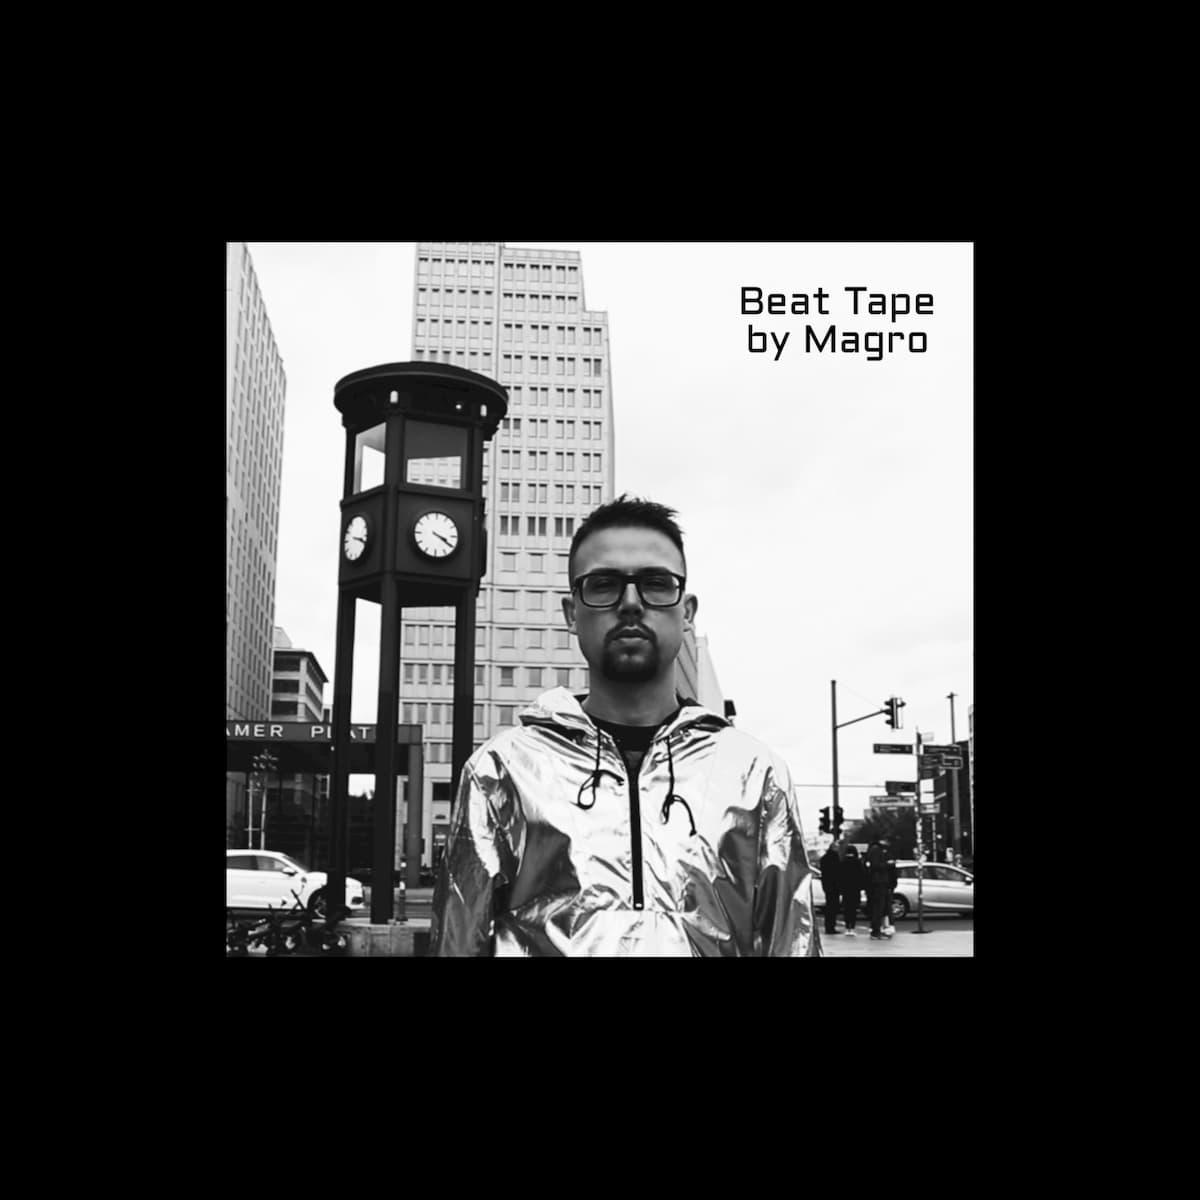 Beattape by Magro | Full Jazzy Stream